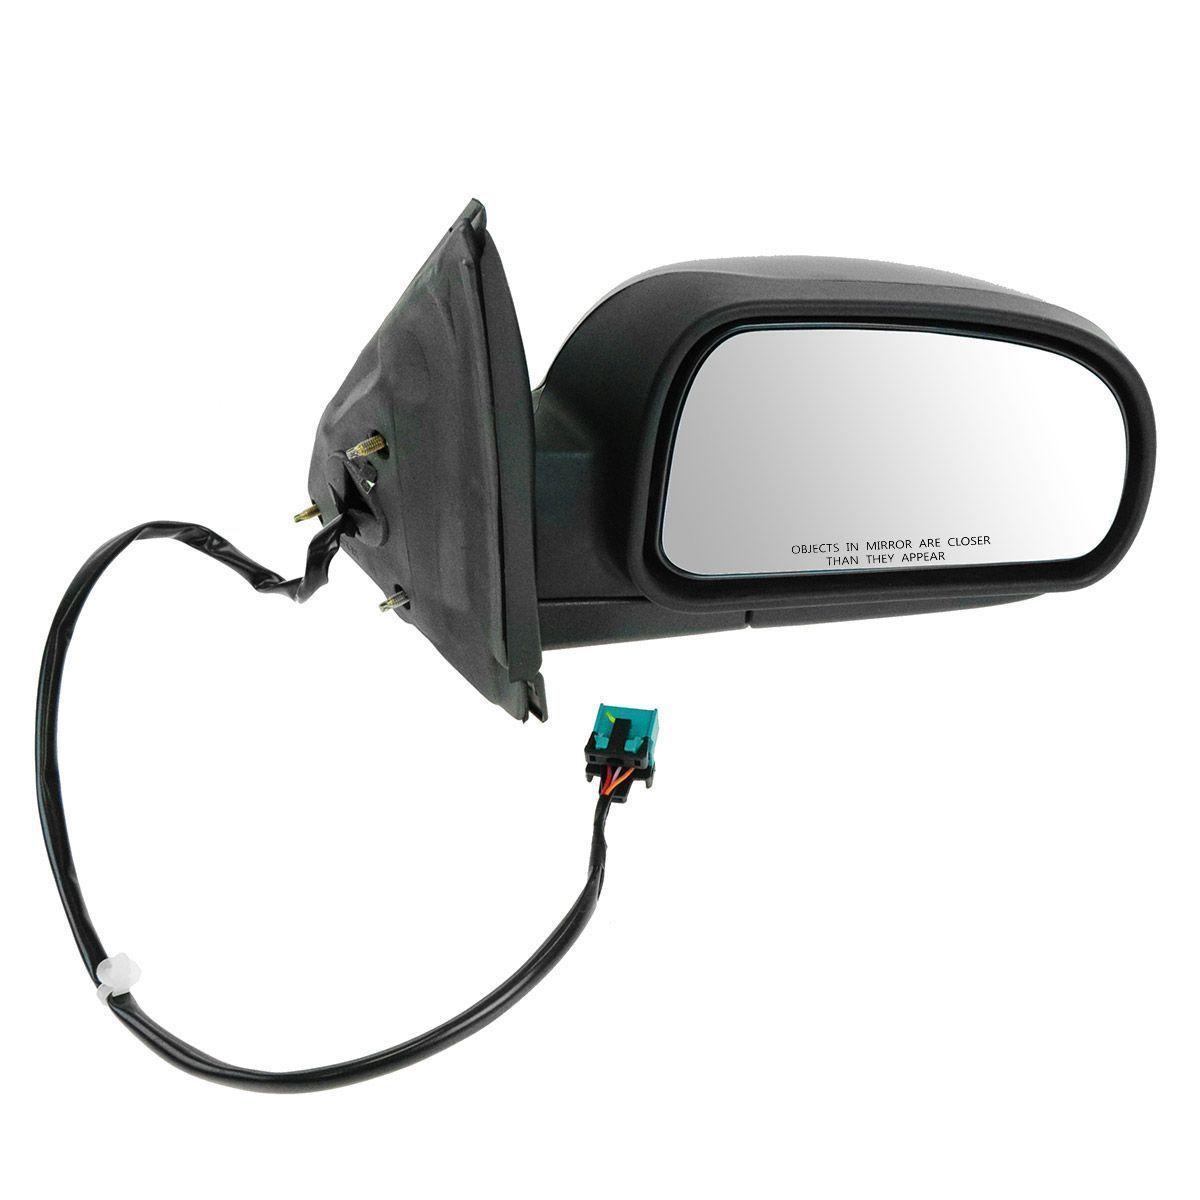 USミラー 右パワー暖房サイドビューミラーエンボイBravadaトレイルブレイザーライナートラック Right Power Heated Side View Mirror For Envoy Bravada Trailblazer Rainer Truck